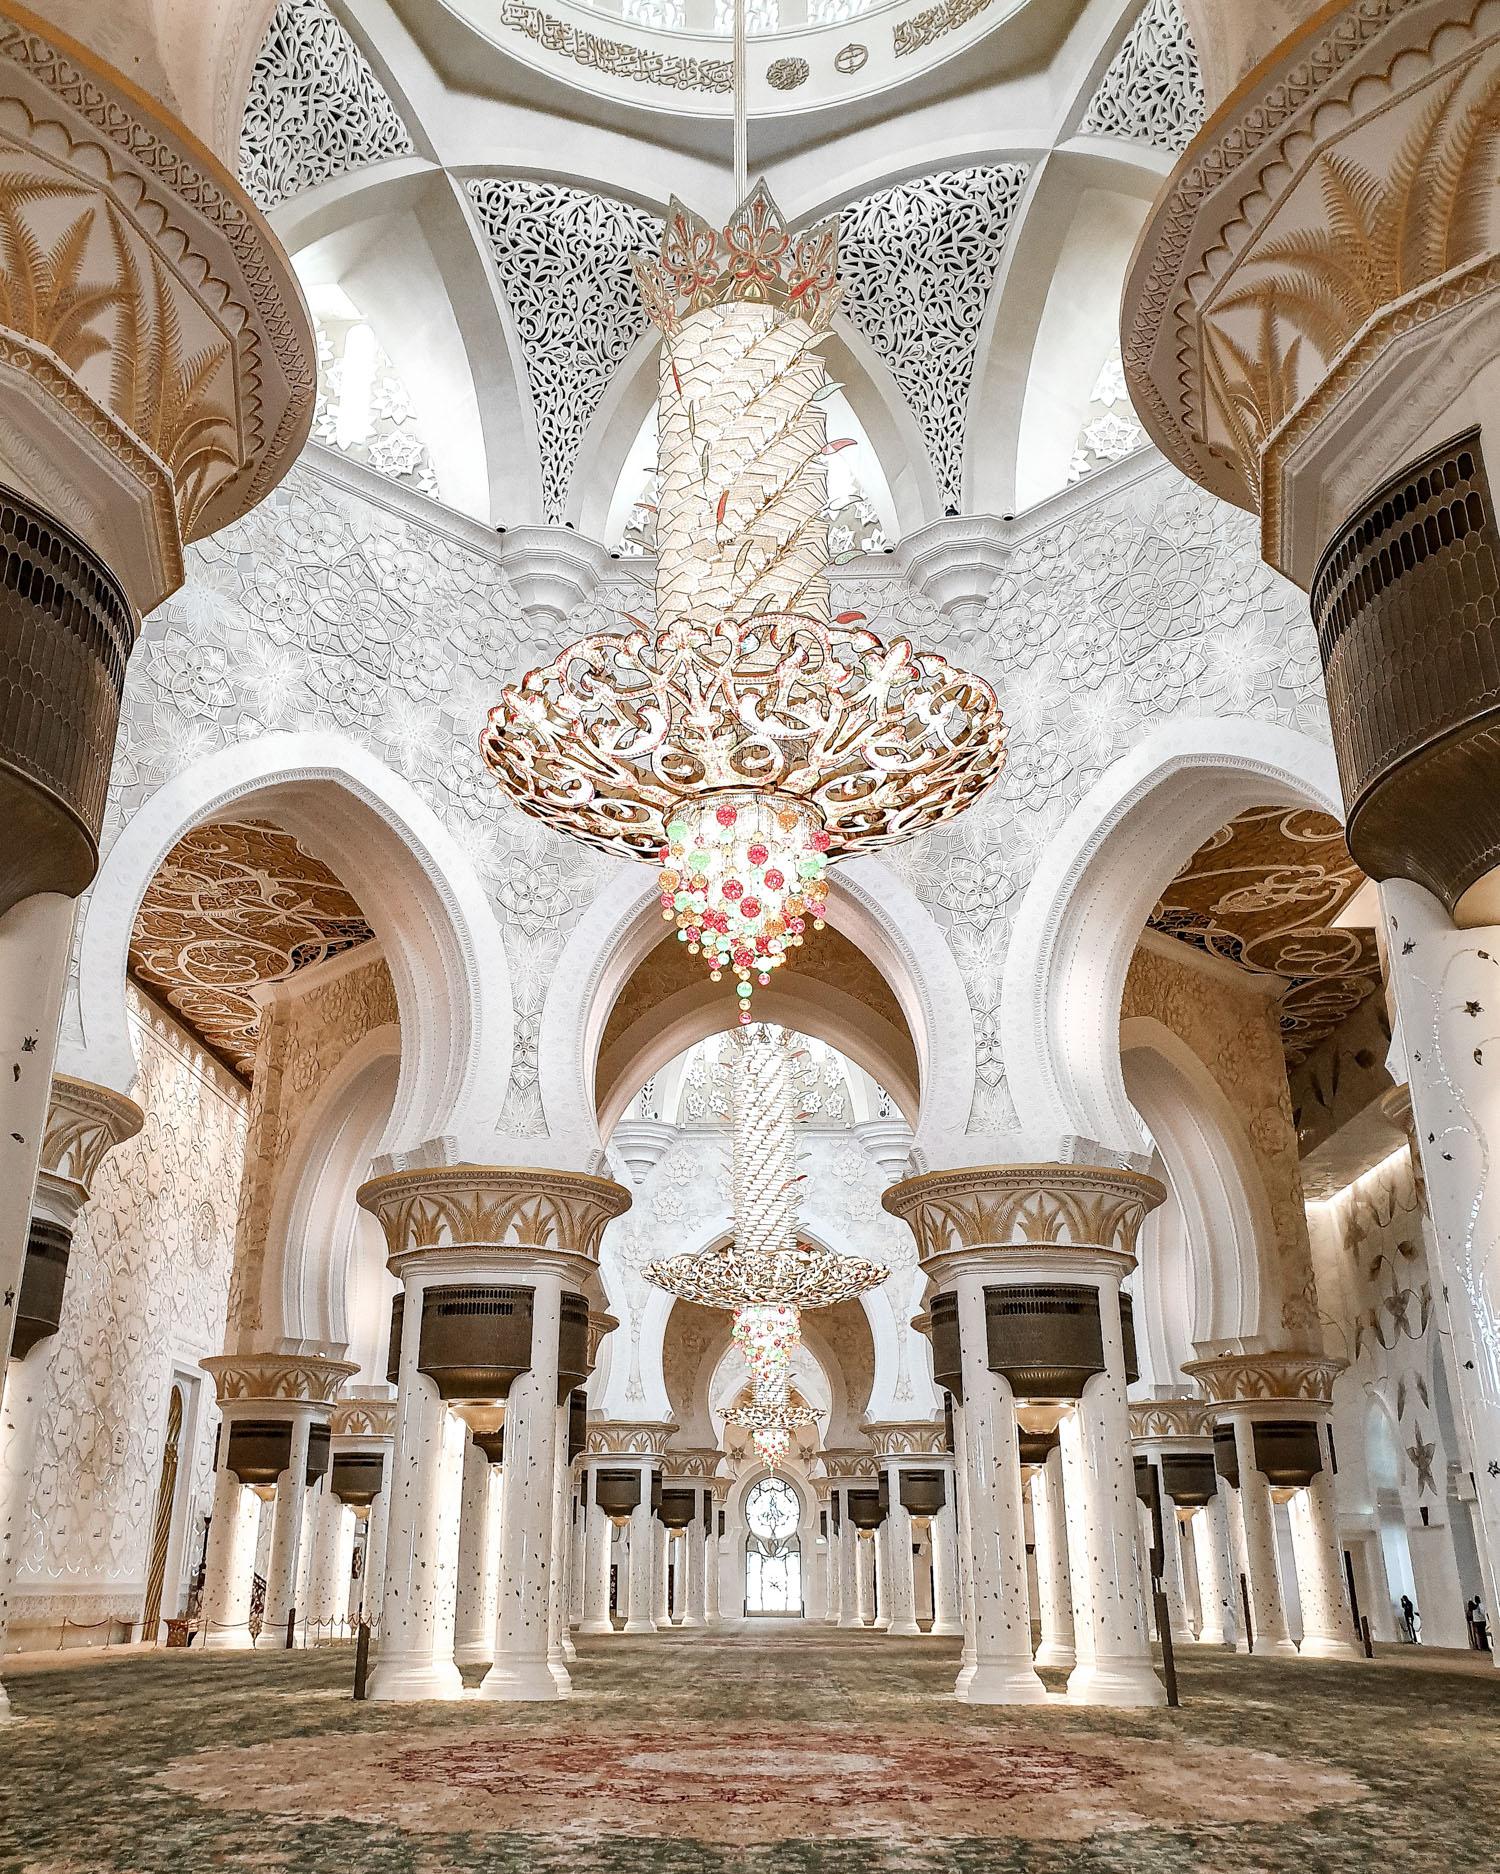 Sheikh Zayed Grand Mosque interior | Day trip to Abu Dhabi from Dubai